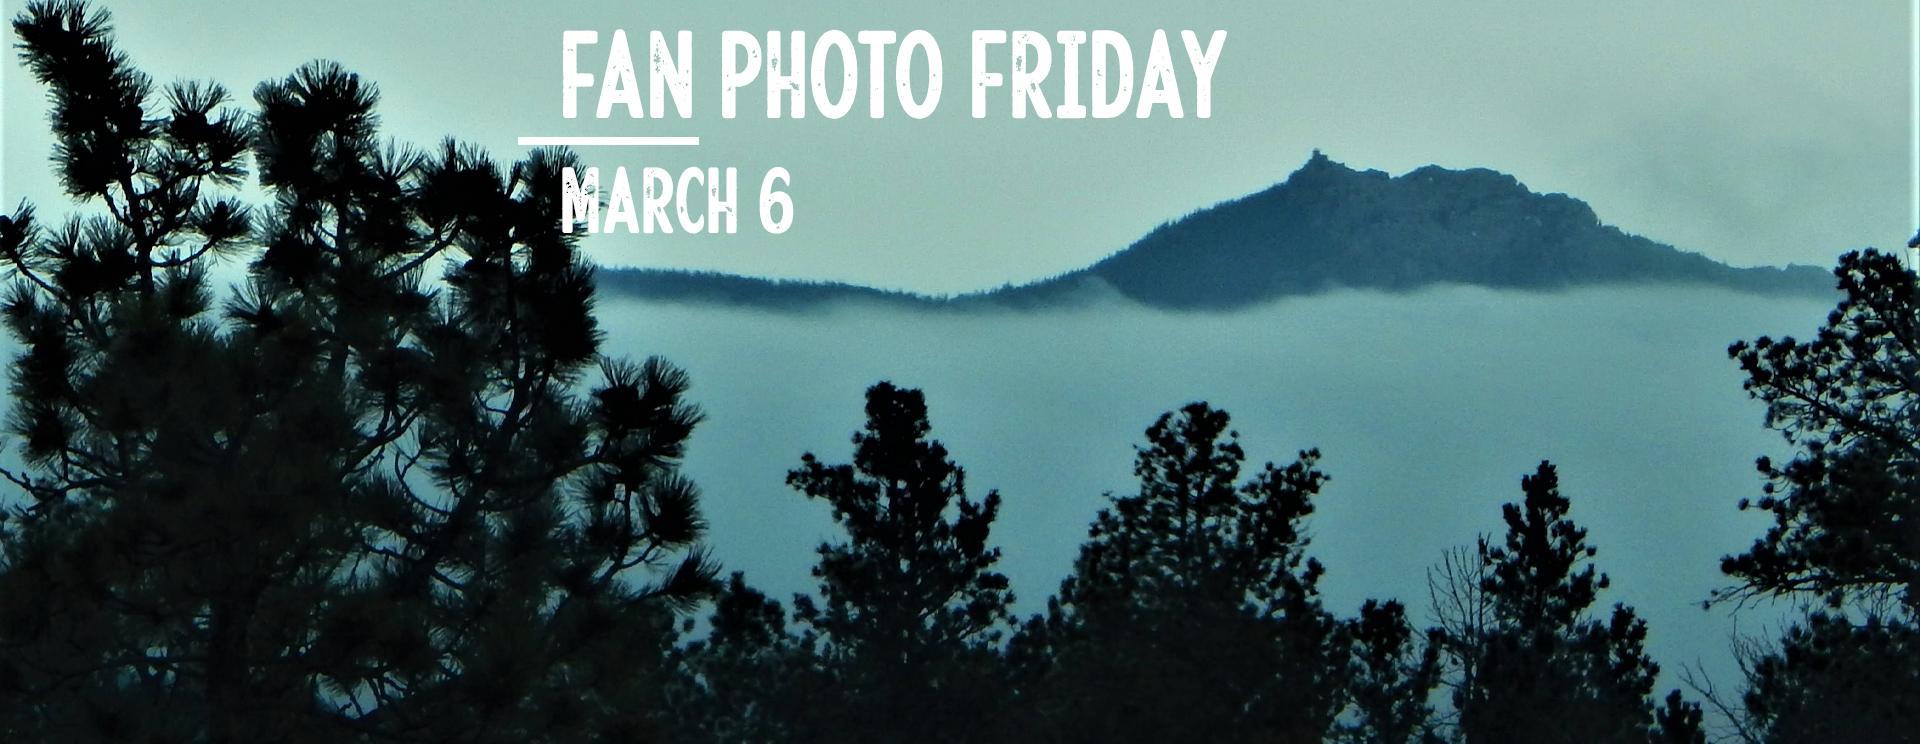 Fan Photo Friday | March 6, 2020